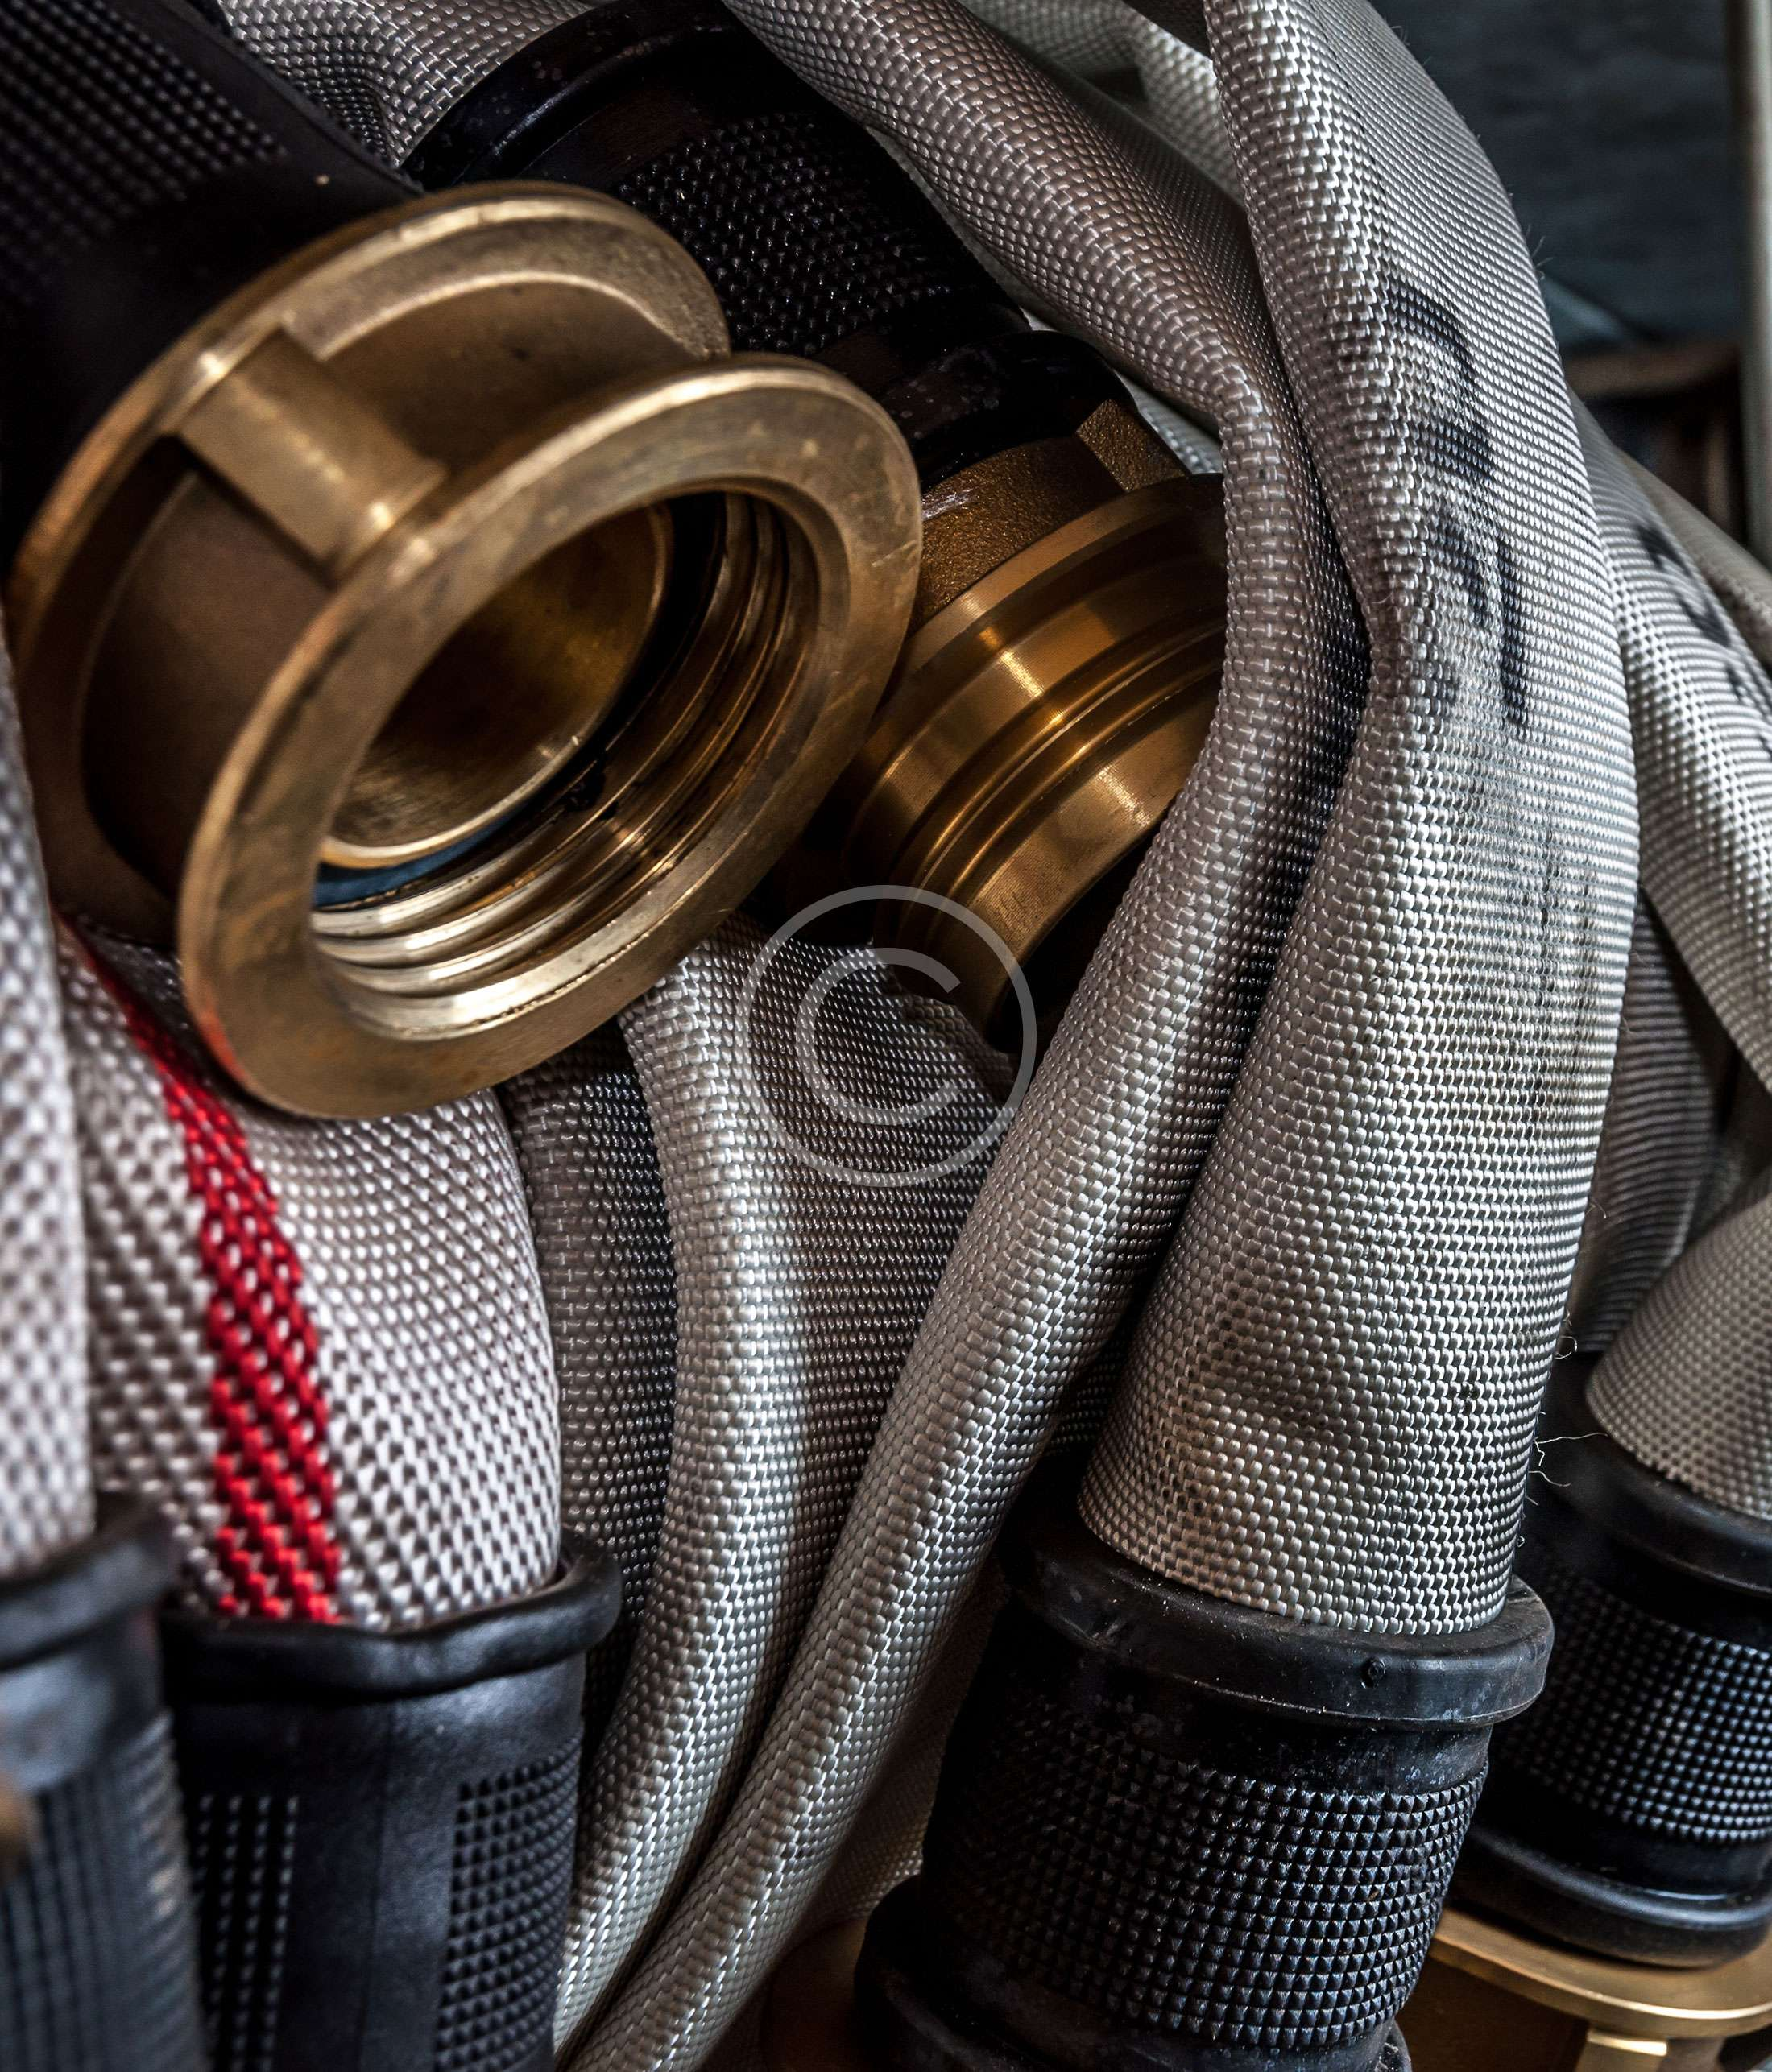 Fire Engineers: 12 Rookie Mistakes